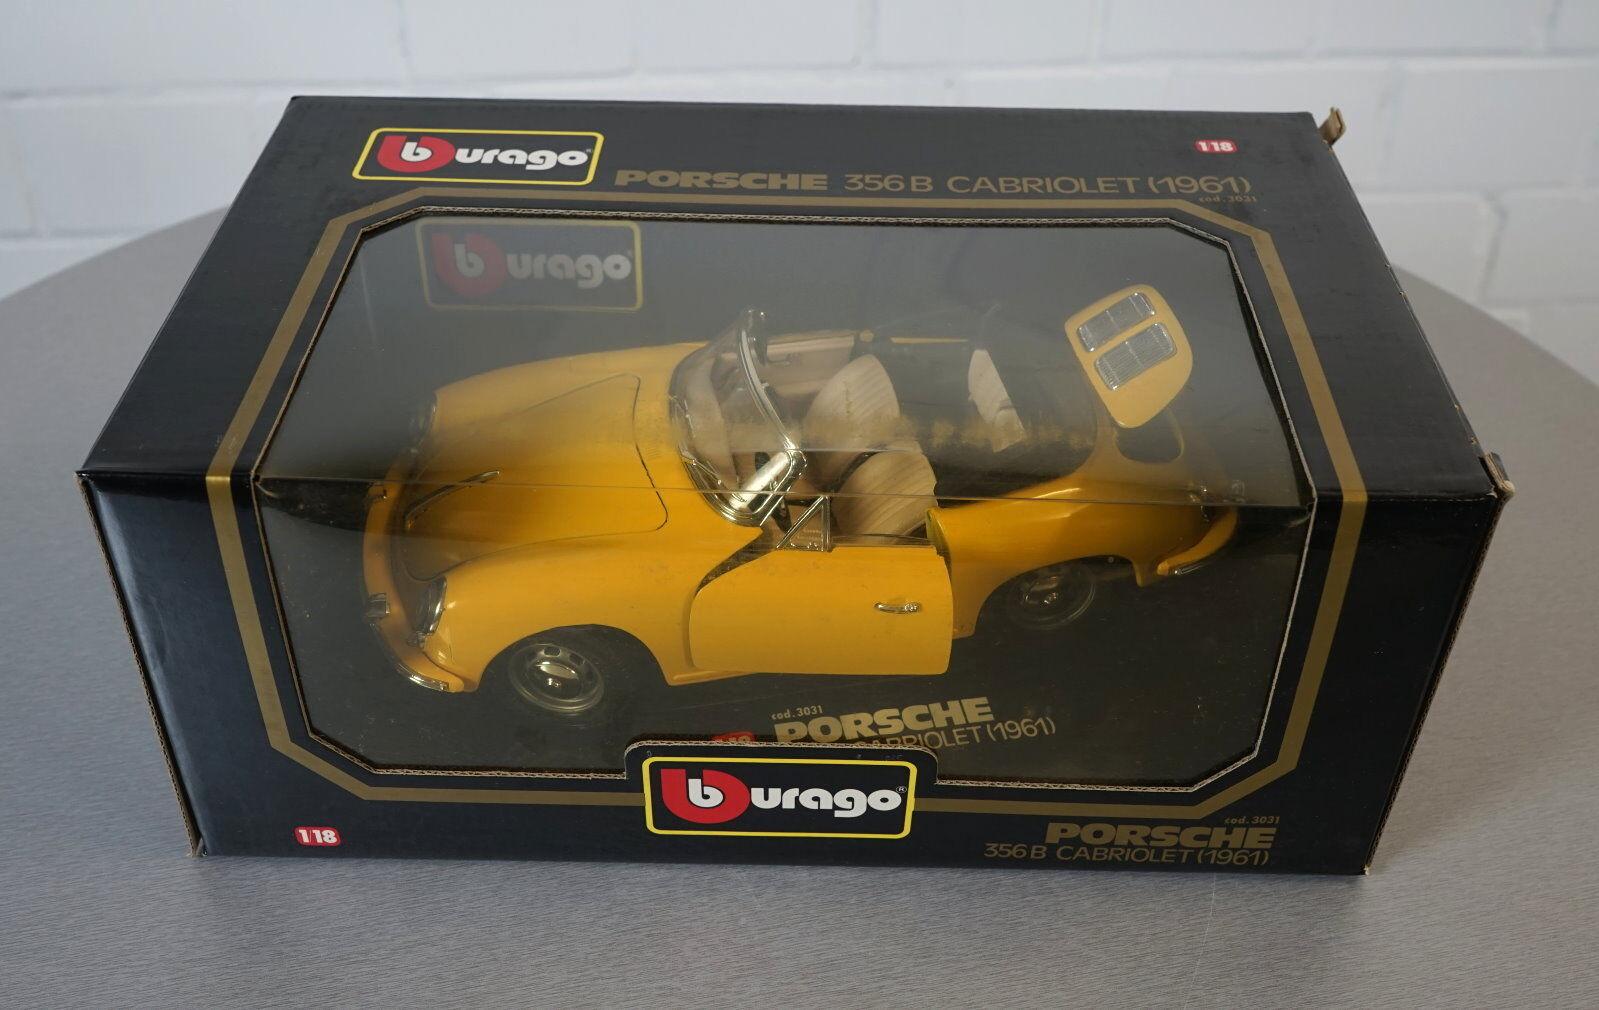 BURAGO 118 PORSCHE 356 B CABRIOLET 1961 Gituttio 3031  DieCast modellolo auto OVP